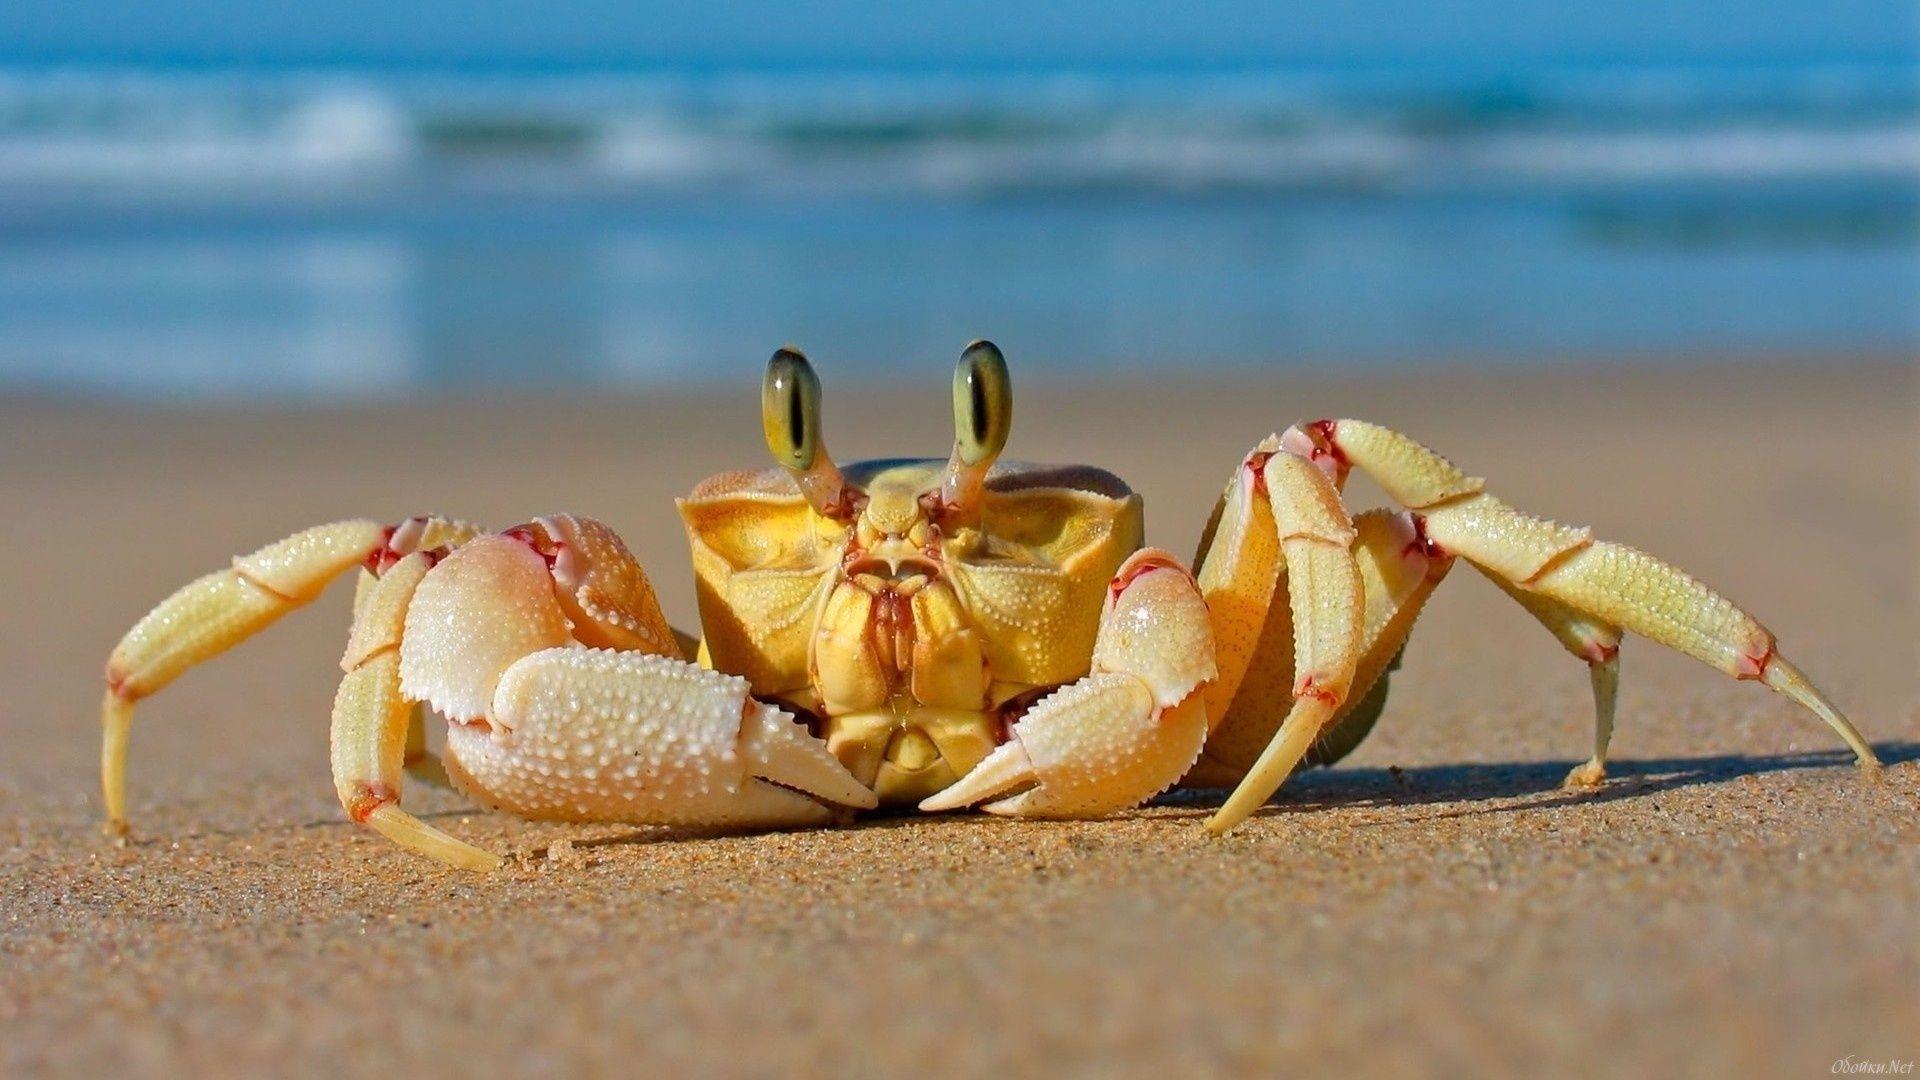 Crab wallpaper photo full hd